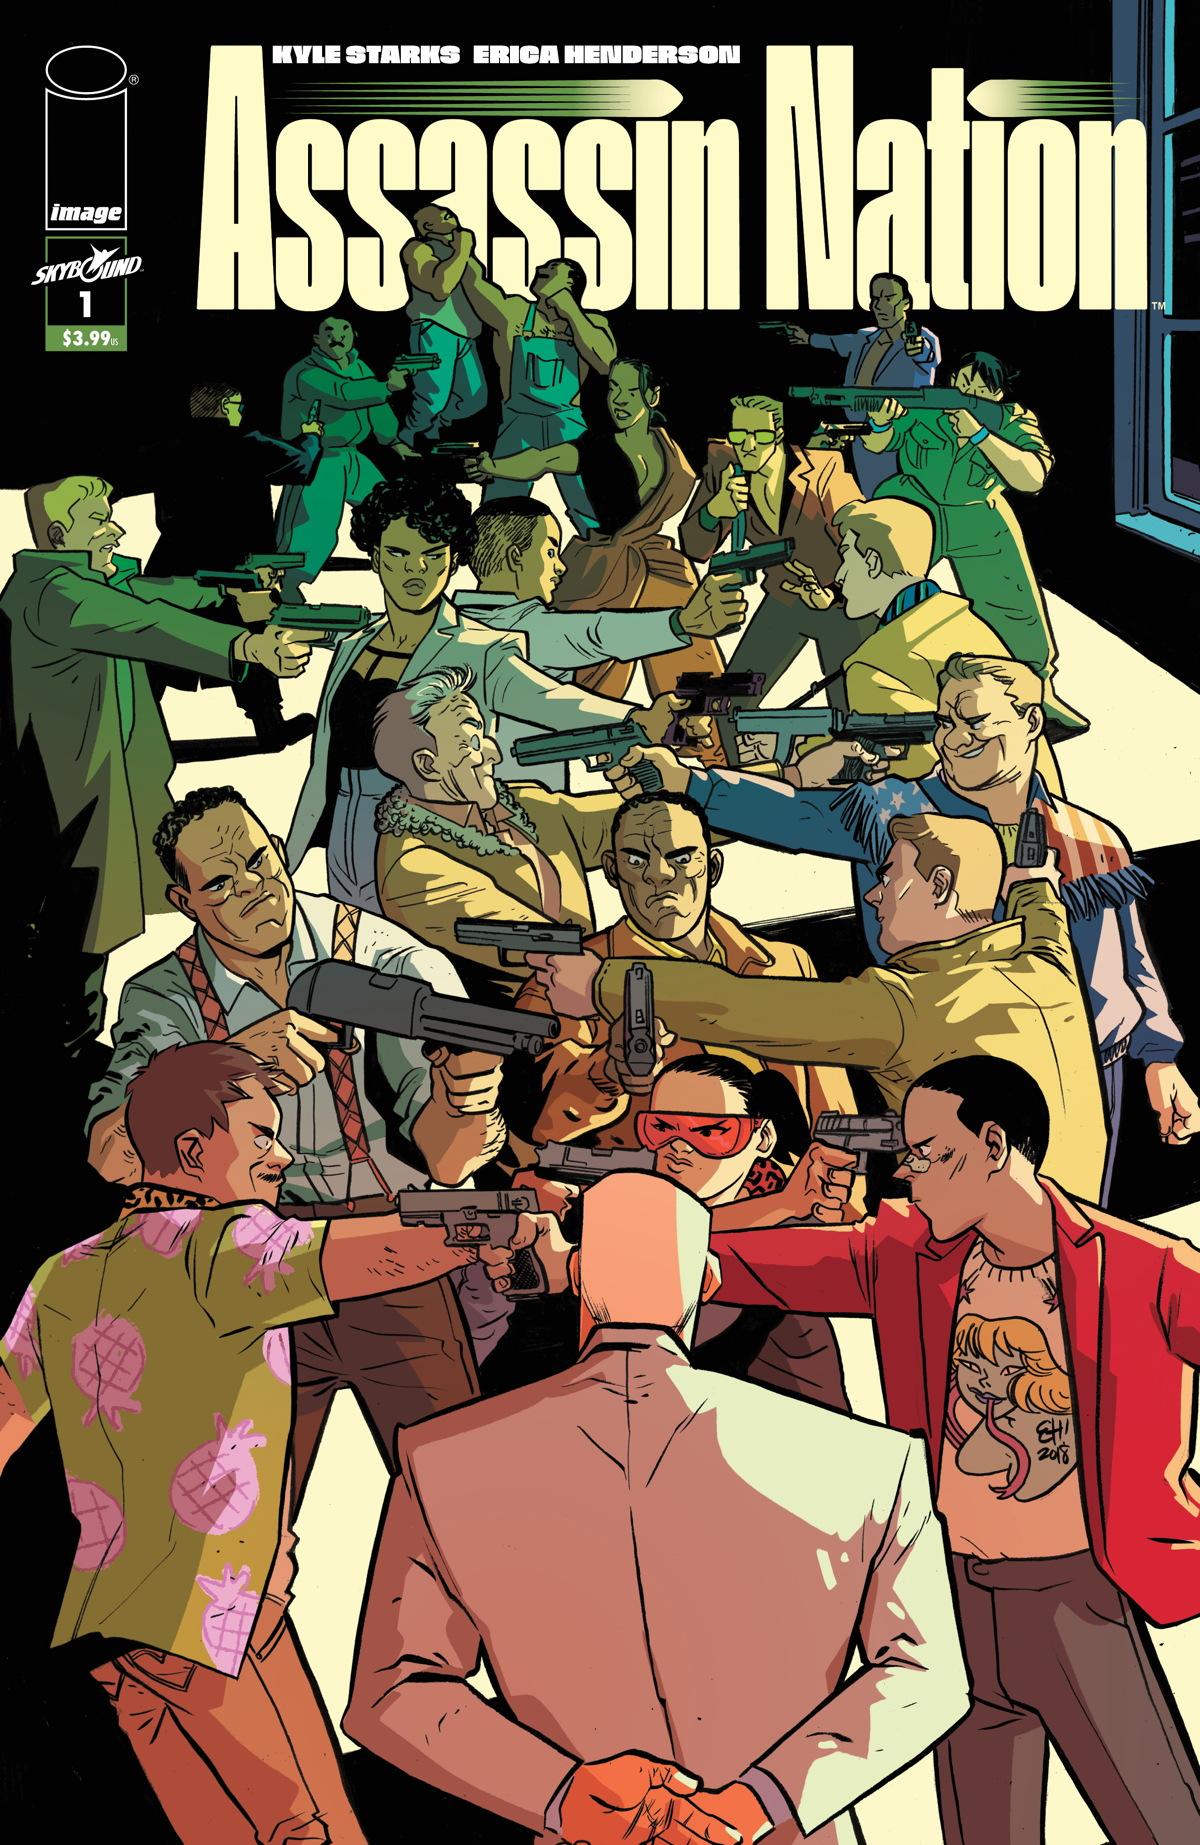 Assassin Nation #1 cover art by Erica Henderson